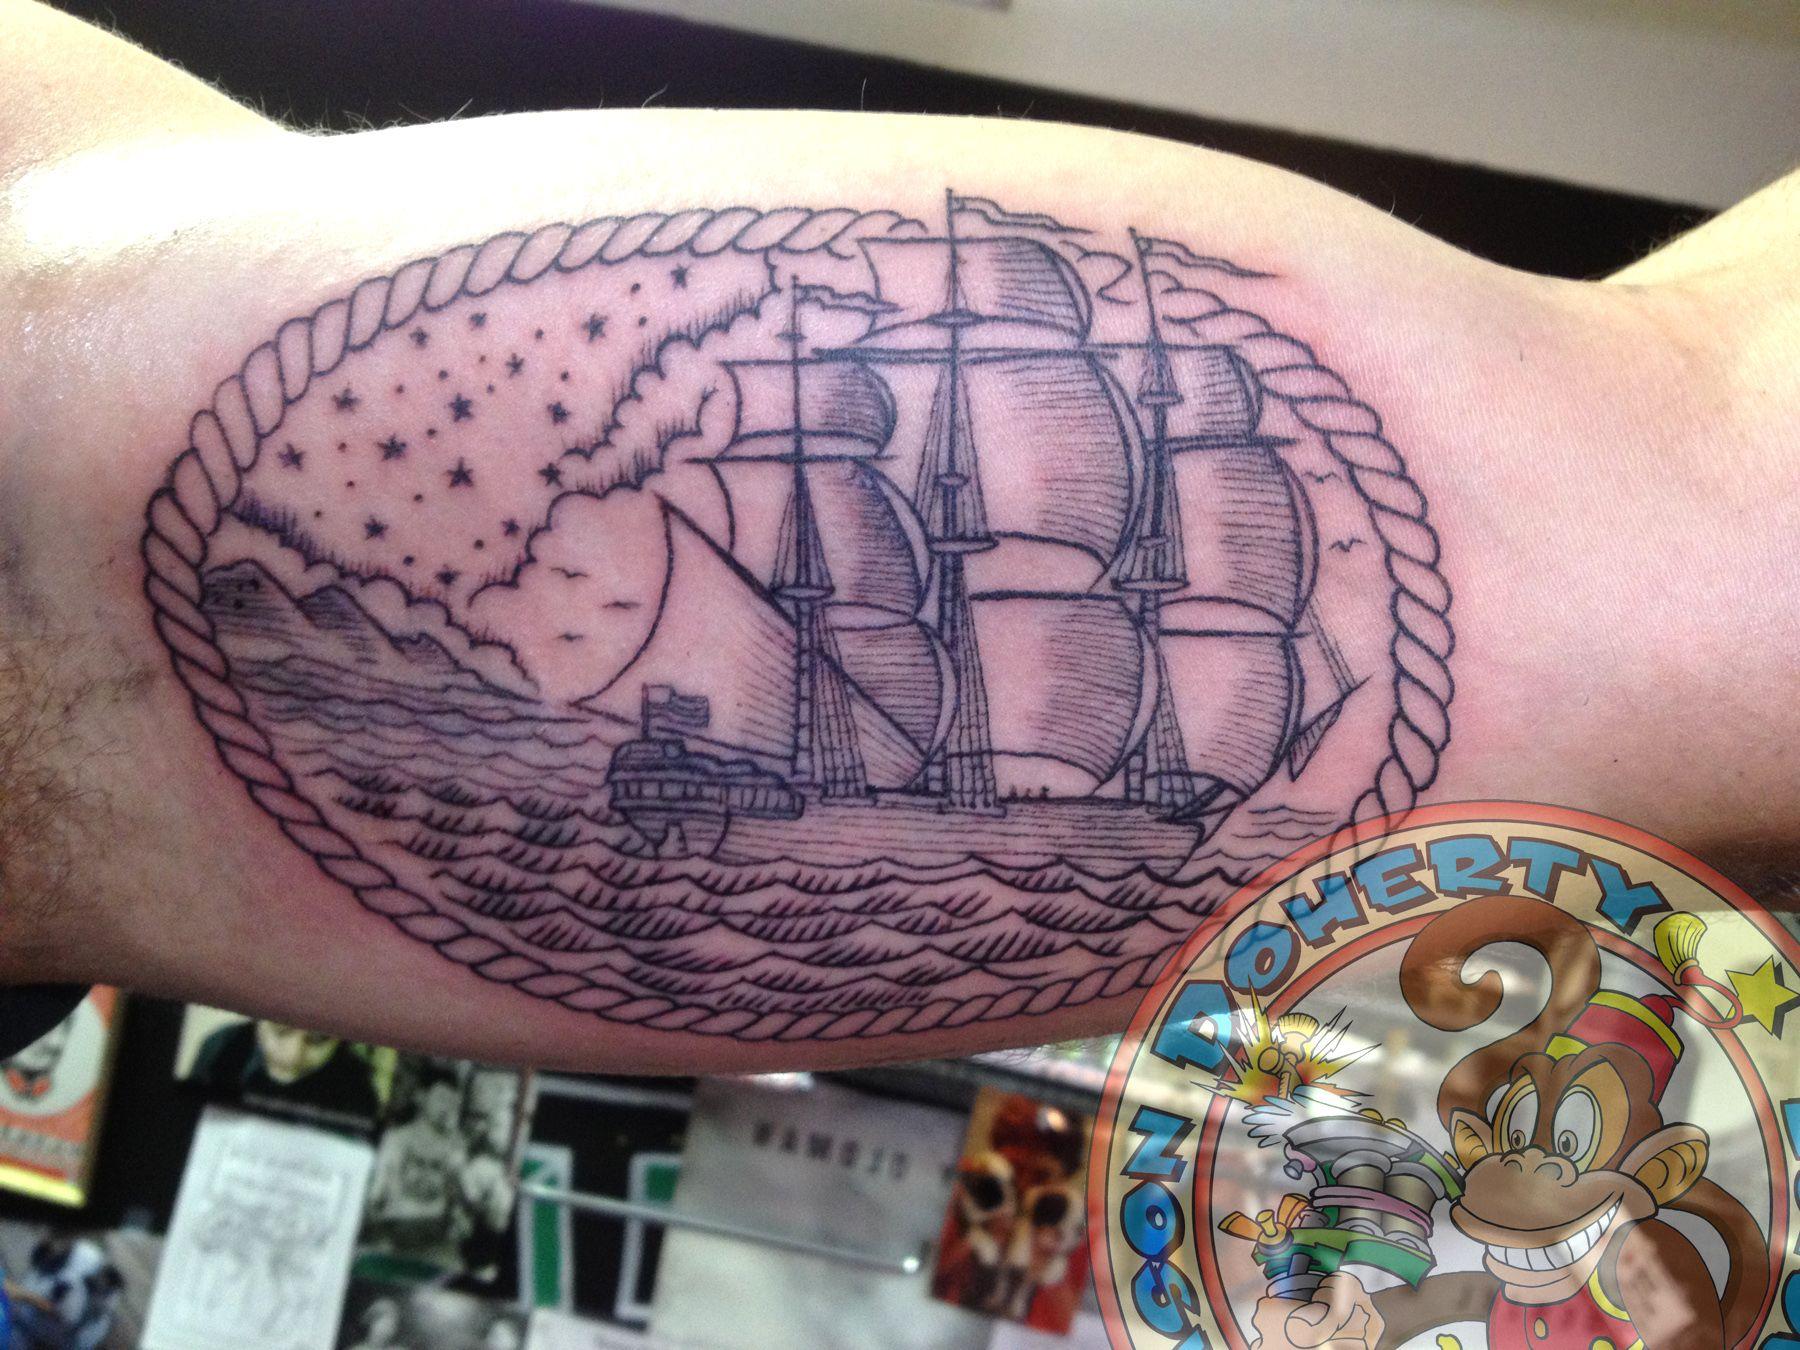 b7d5b6767 scrimshaw #tattoo My name is #jason #doherty I am a #Professional ...